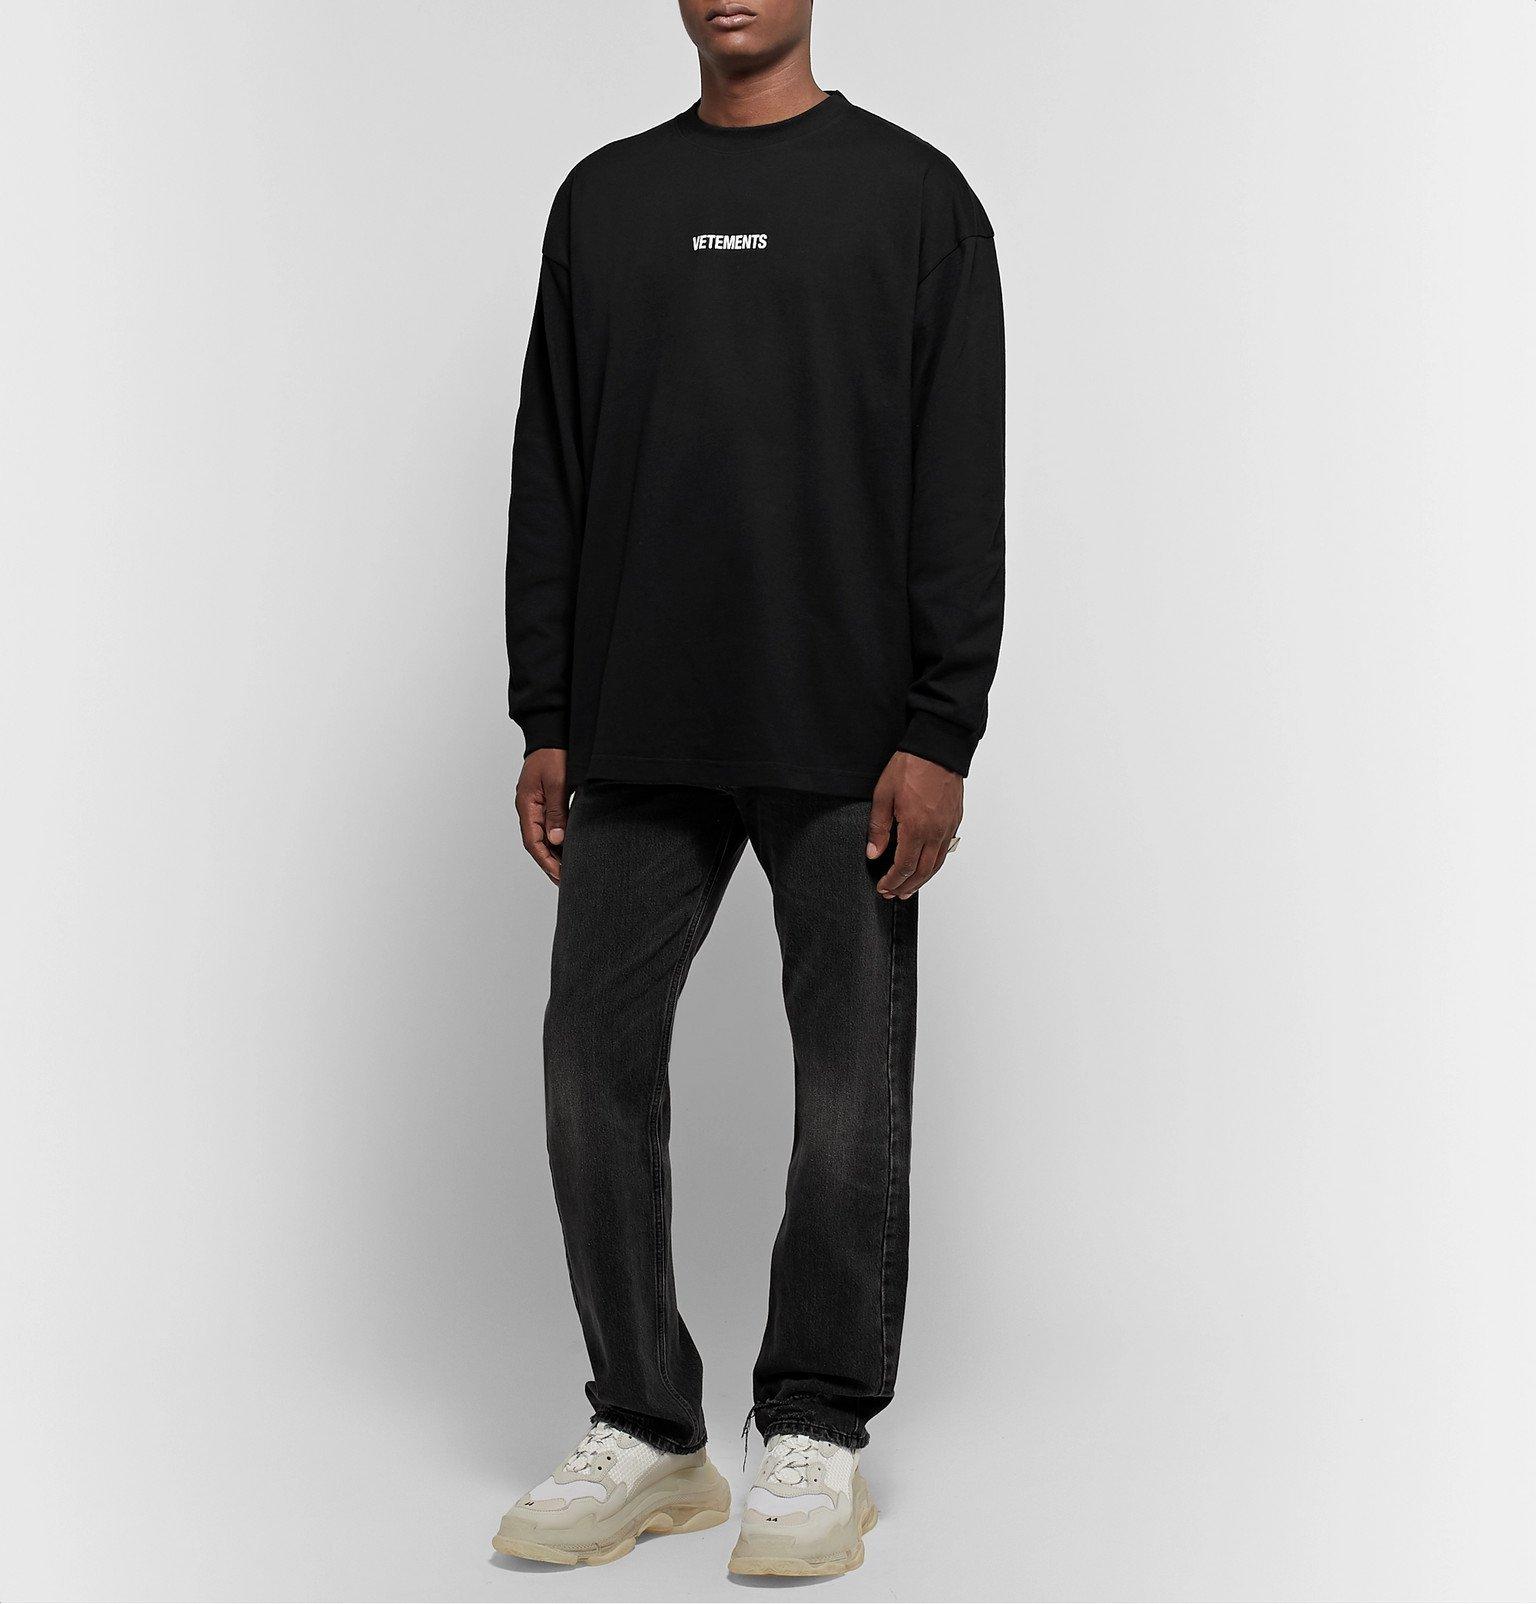 Vetements - Oversized Logo-Print Cotton-Jersey T-Shirt - Black